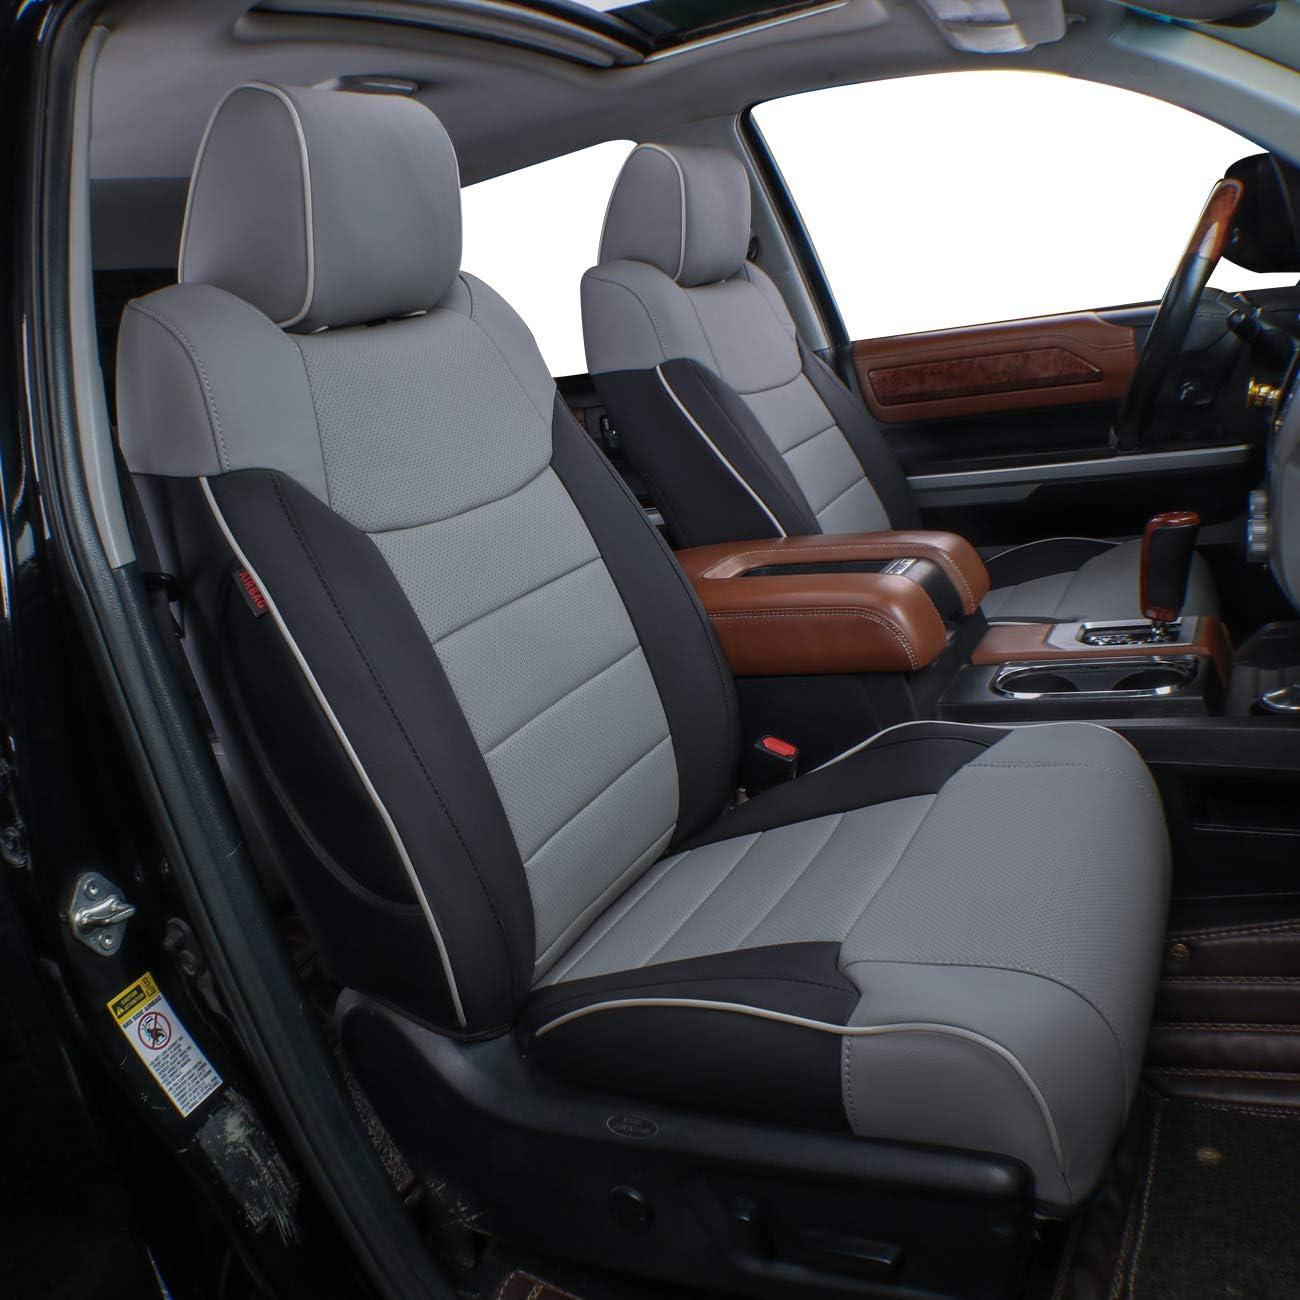 Amazon Com Ekr Custom Fit Full Set Car Seat Covers For Select Toyota Tundra Crewmax 2014 2015 2016 2017 2018 2019 2020 2021 Leatherette Black Gray Automotive